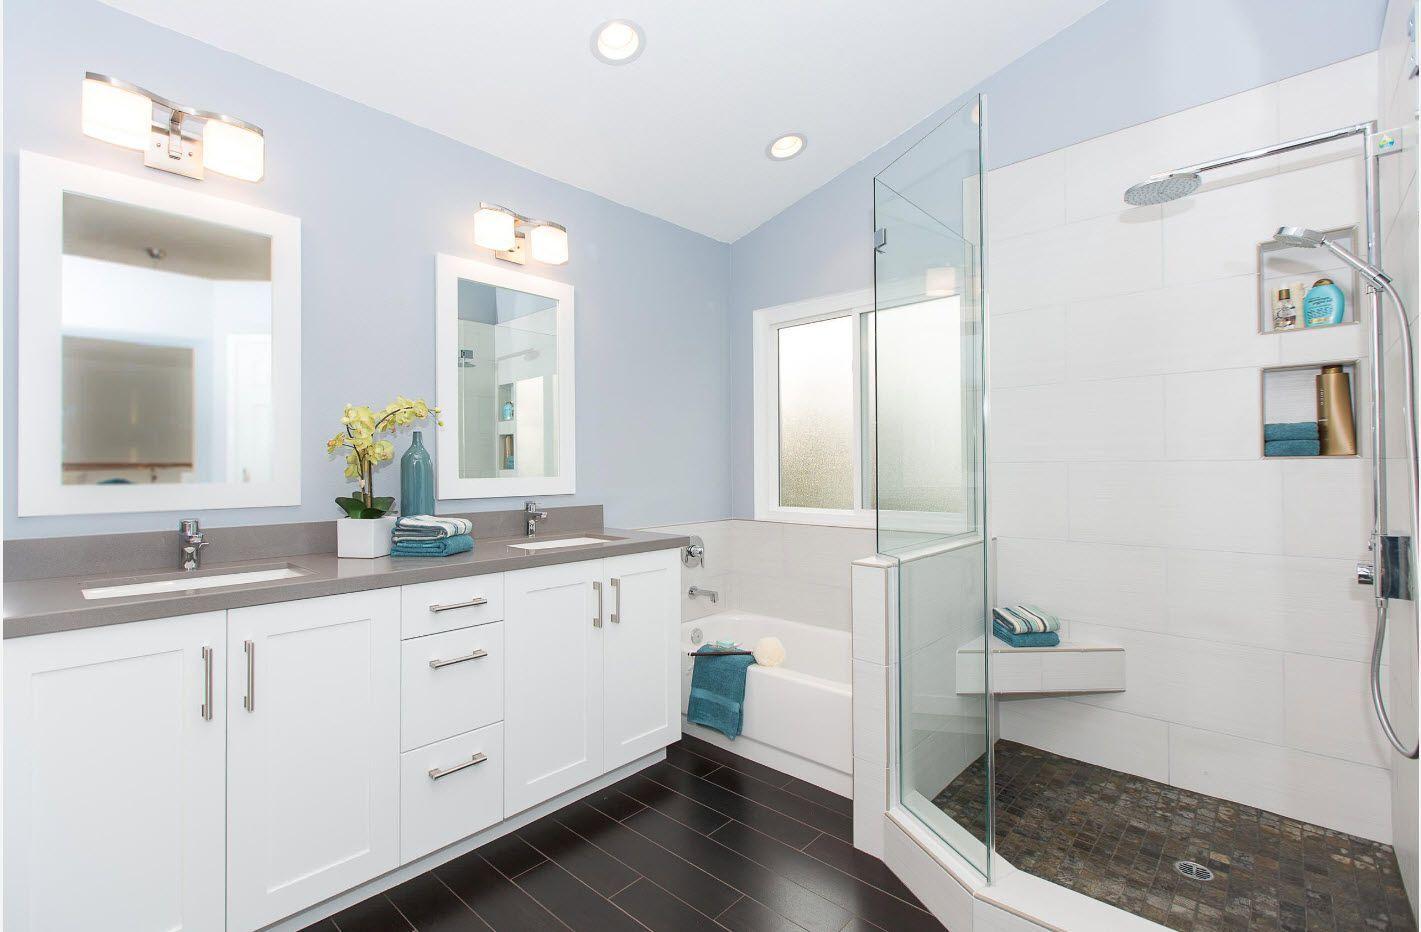 bathroom design trends decoration ideas 2017 small design ideas